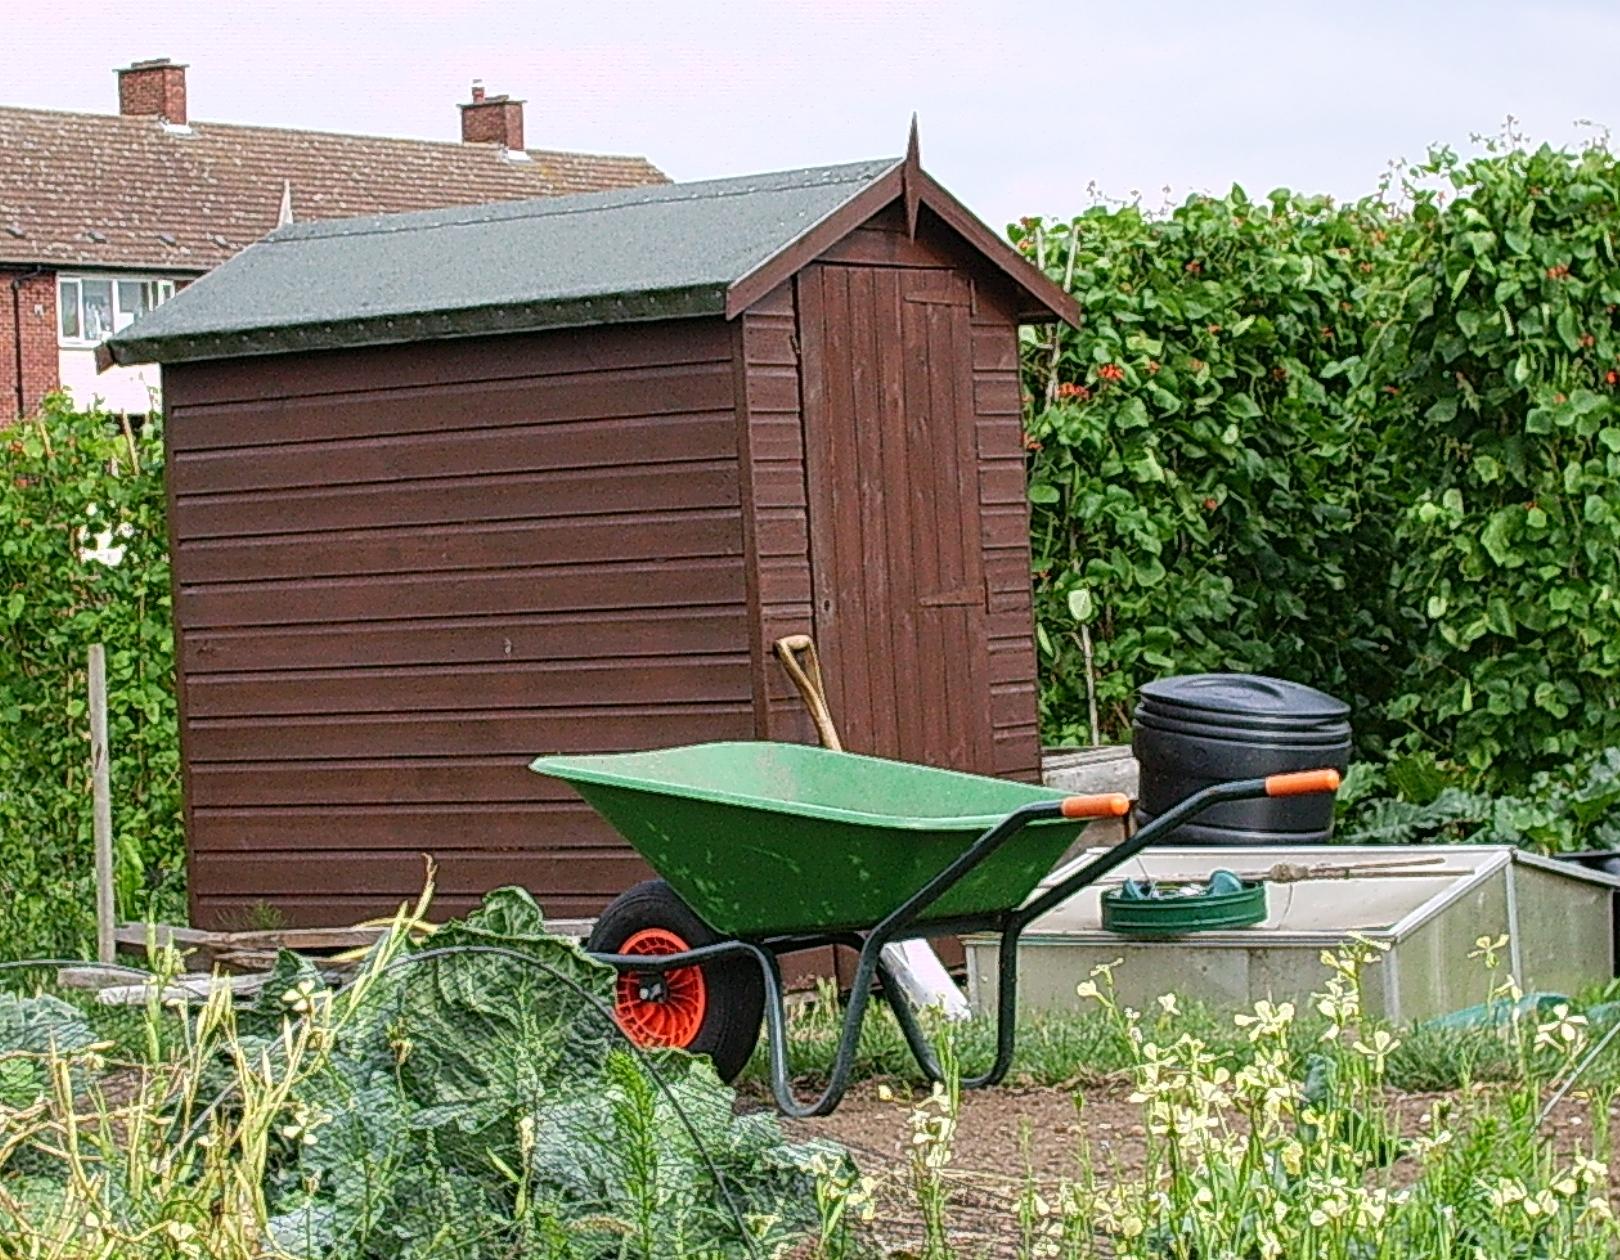 File:Elmgrove allotment shed.jpg - Wikimedia Commons